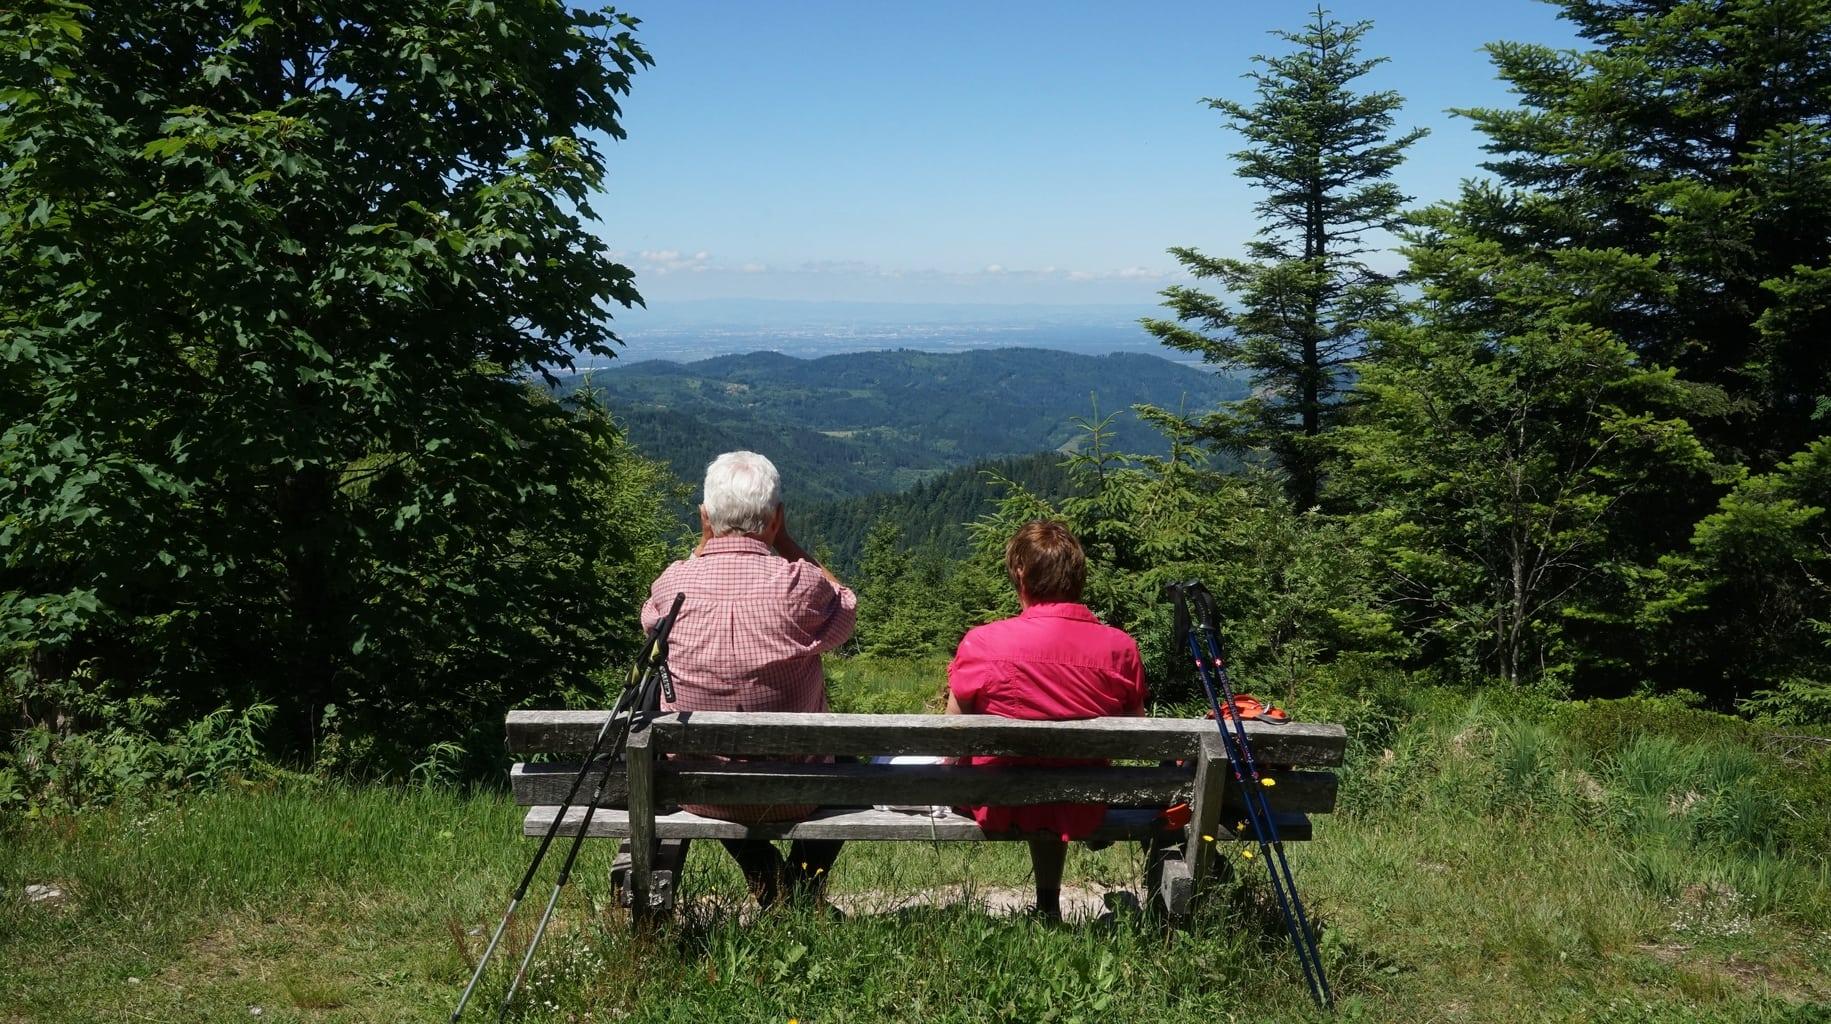 Rondom Baiersbronn is een 585 km lang wandelwegennetwerk